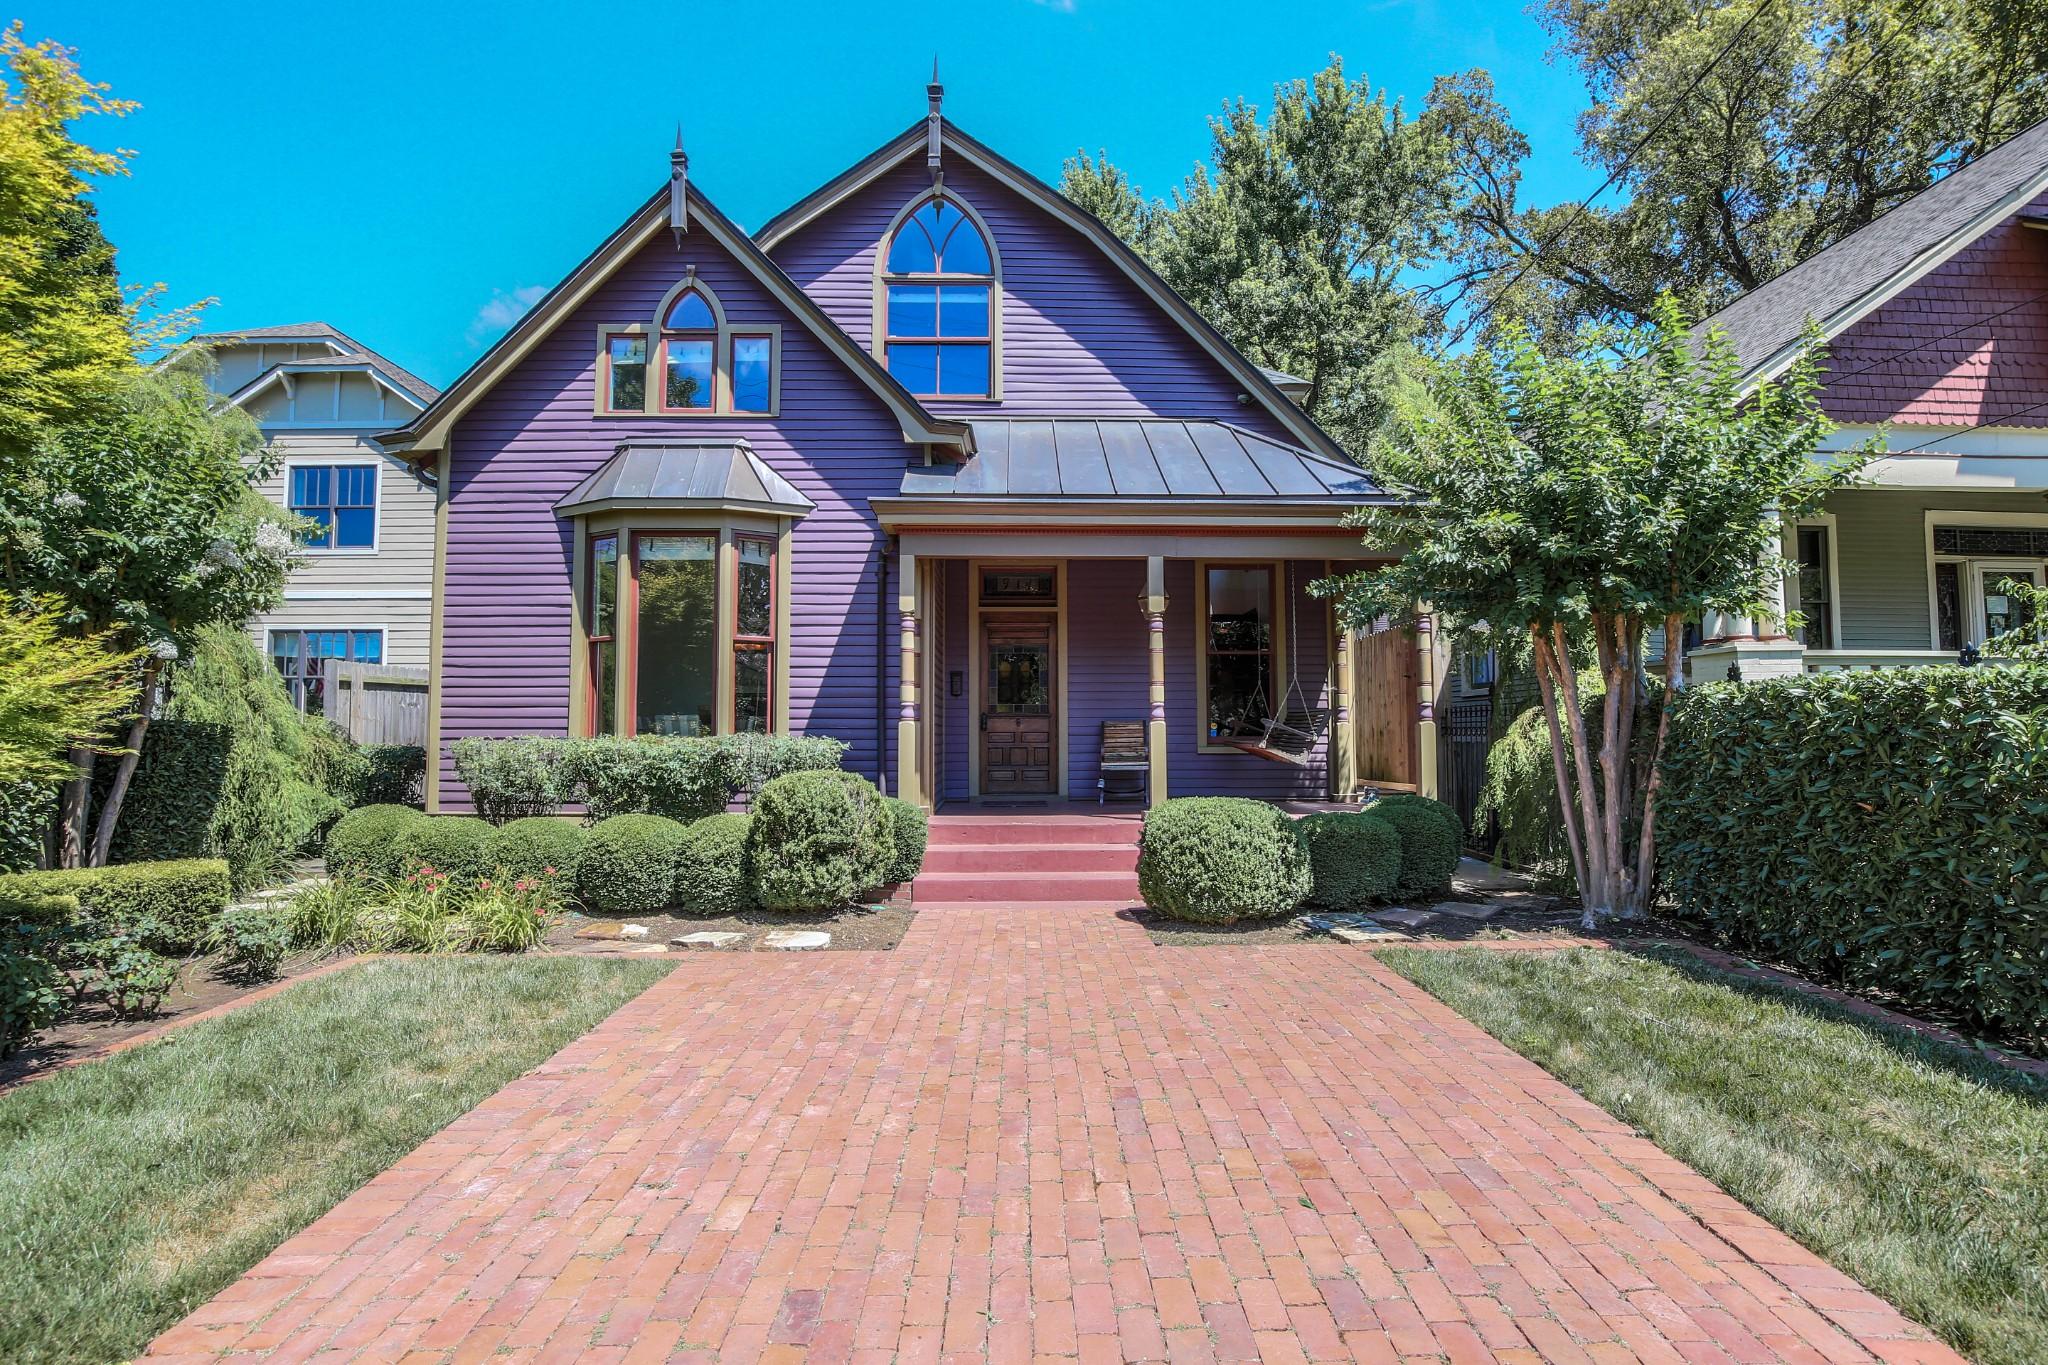 914 S Douglas Ave Property Photo - Nashville, TN real estate listing